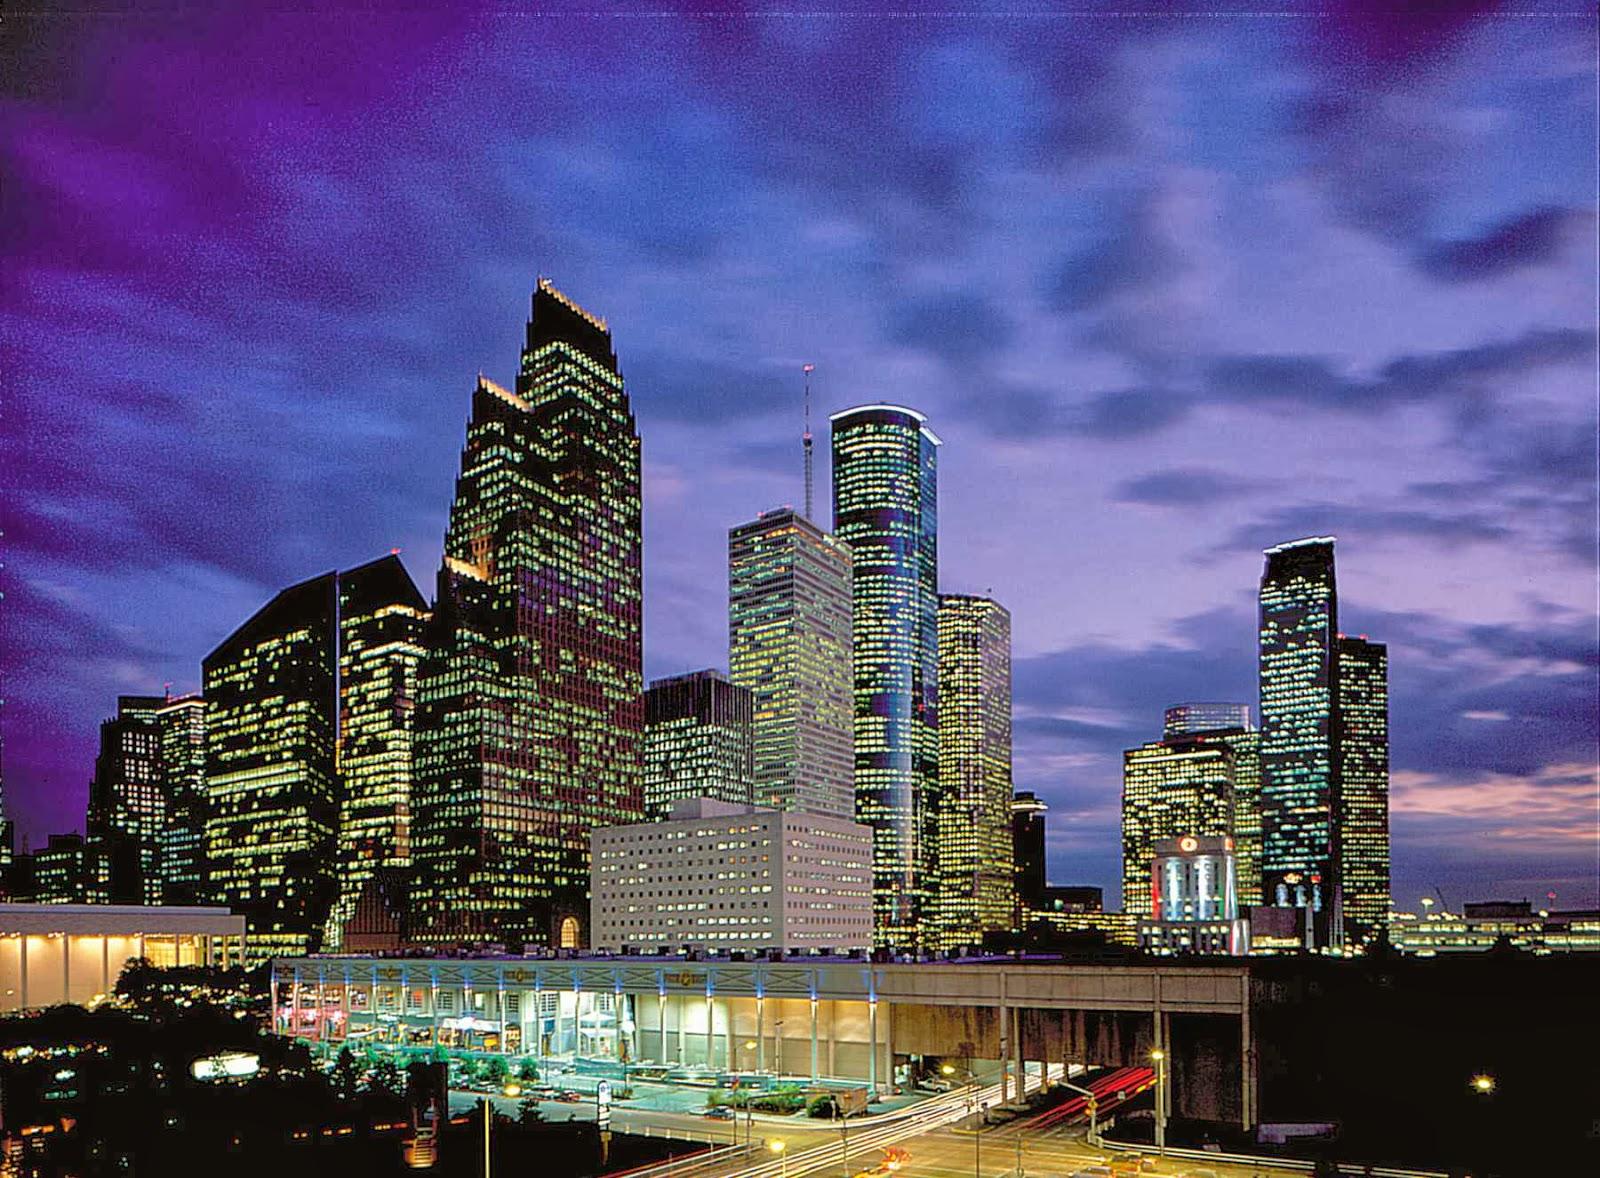 Houston Skyline Desktop Wallpaper: Cool Houston City HD Pictures 2015